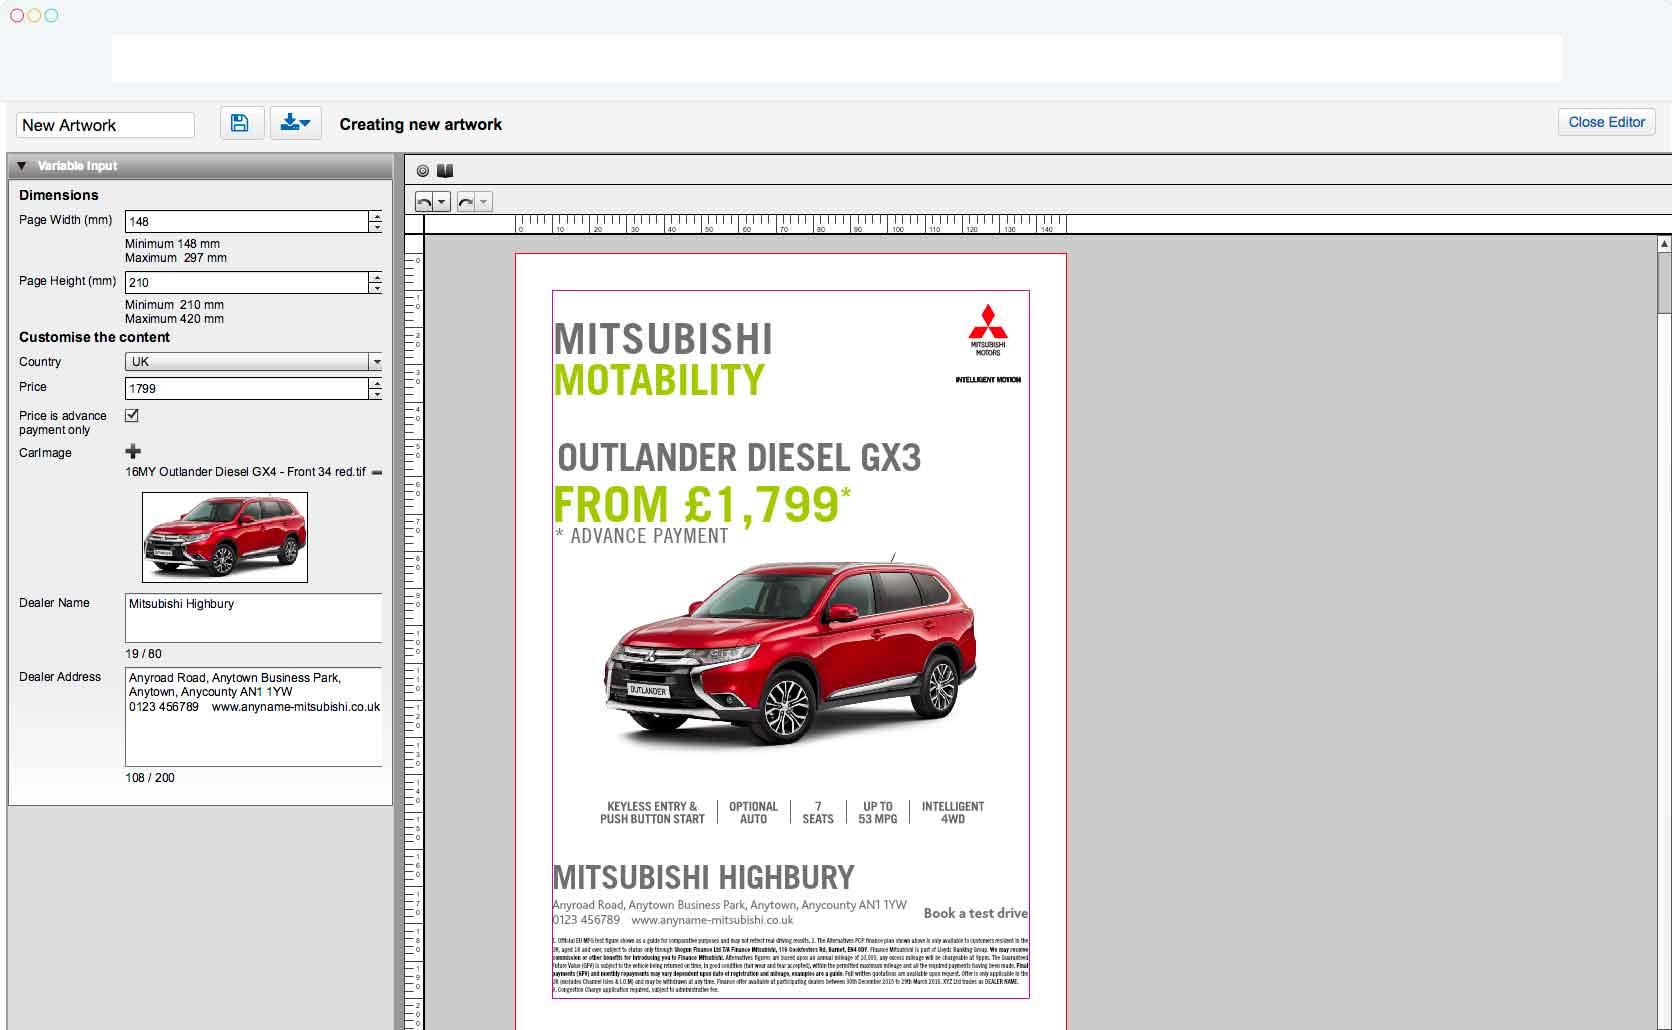 Web-to-Publish Mitsubishi